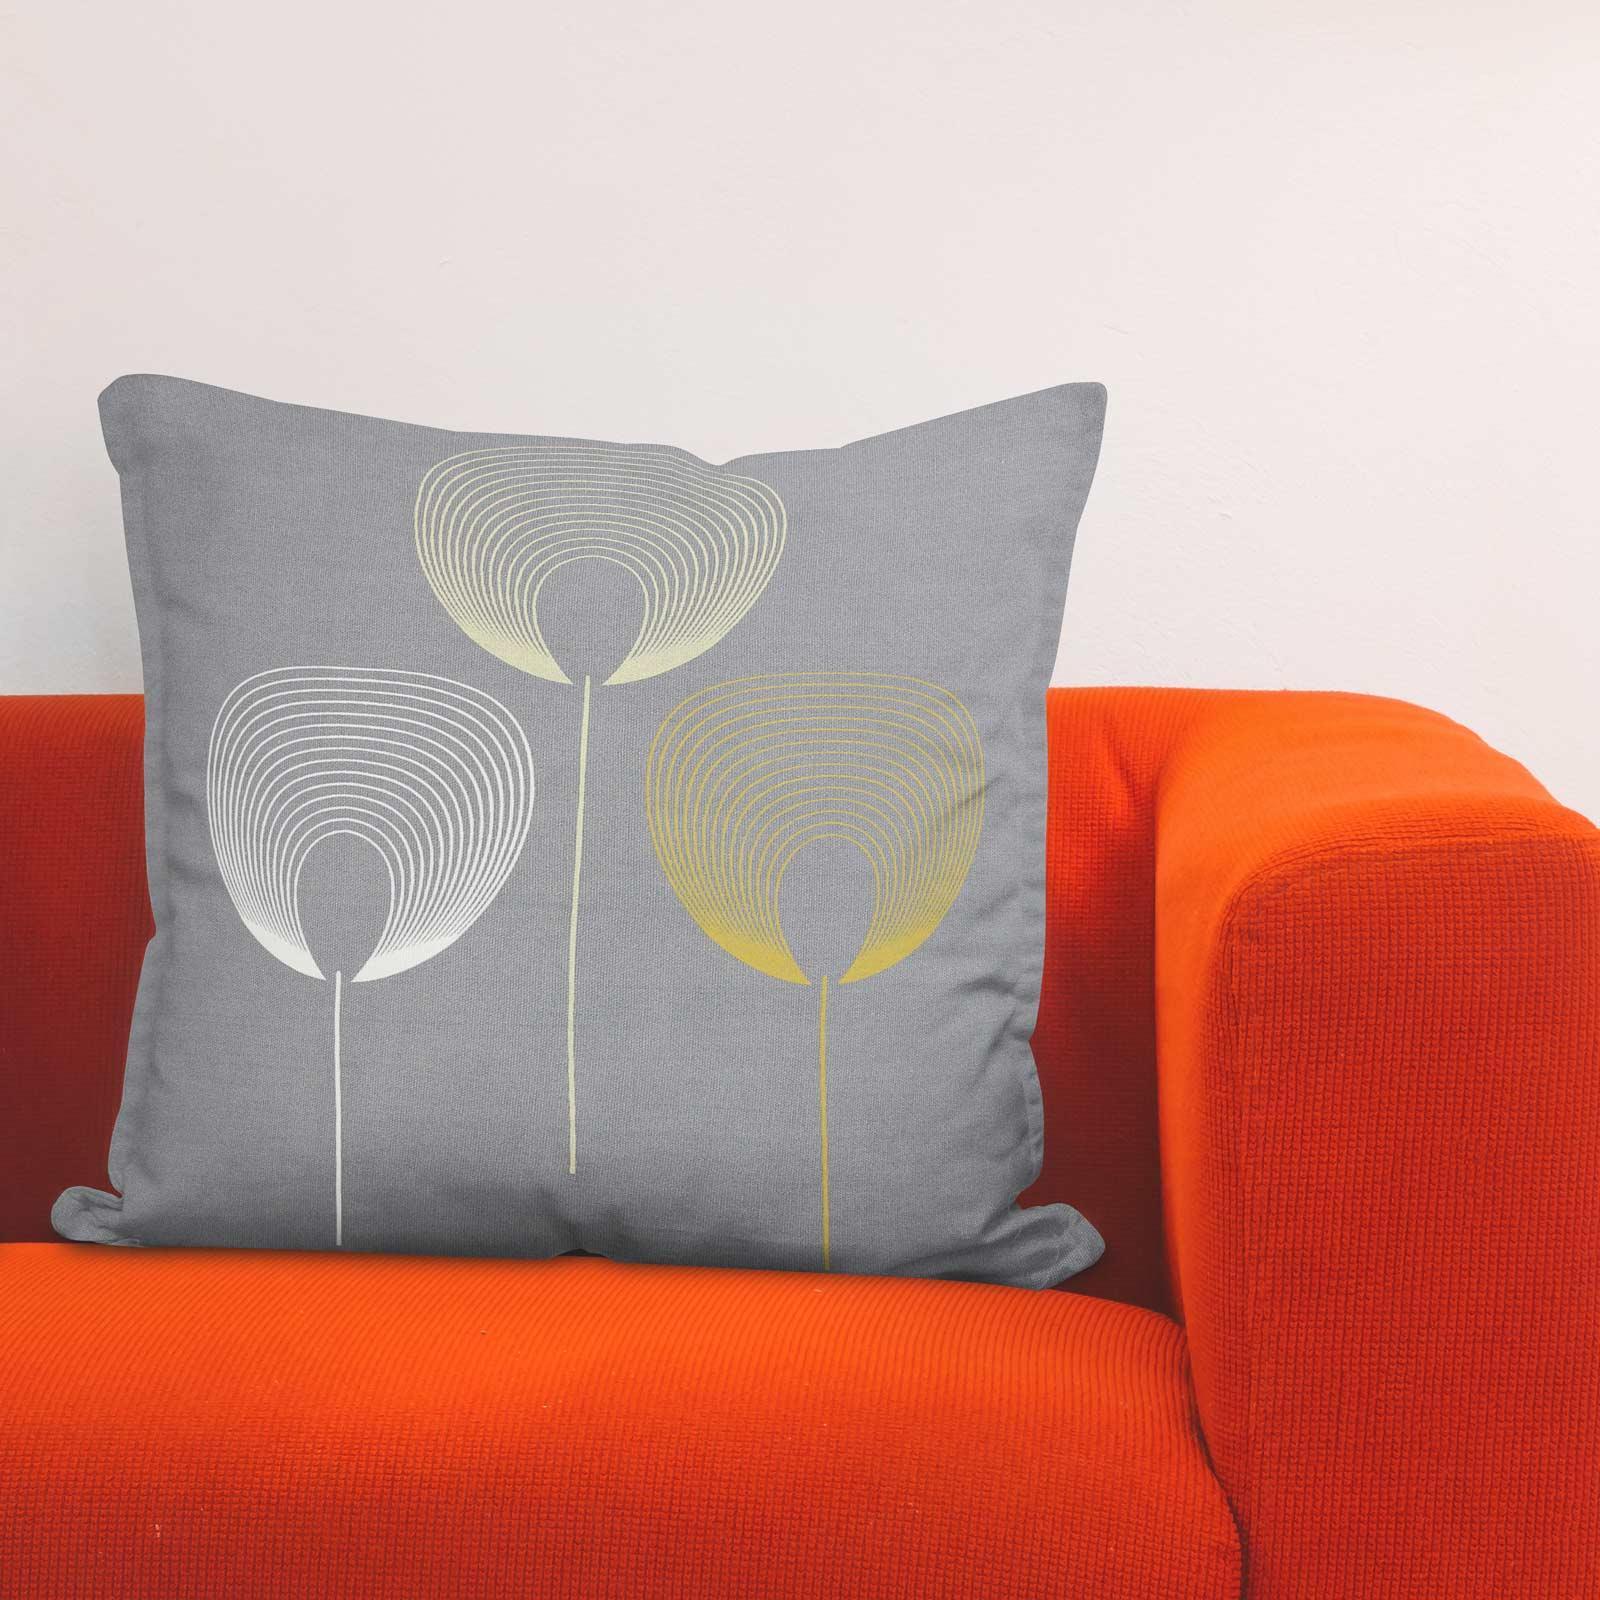 Geometrica-Cushion-Covers-Cojines-De-Impresion-Floral-Gris-Beige-Ocre-cubre-17-034-X-17-034 miniatura 19